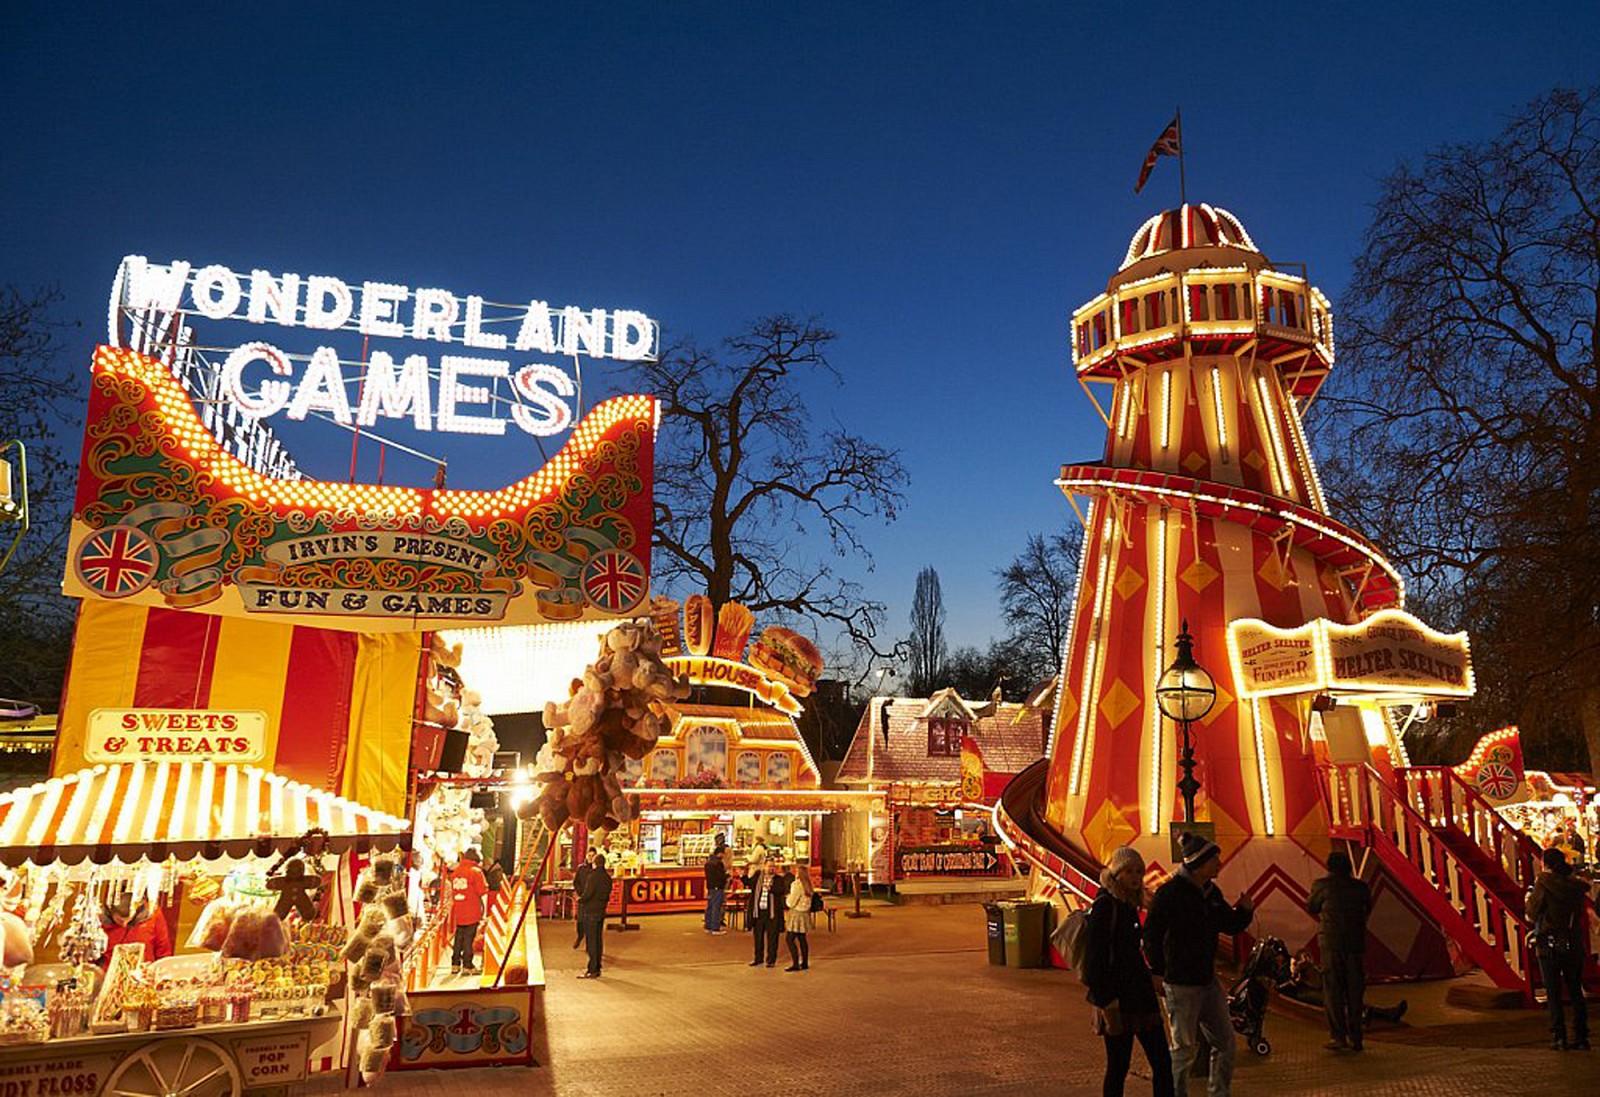 Winter Wonderland Hyde Park Games